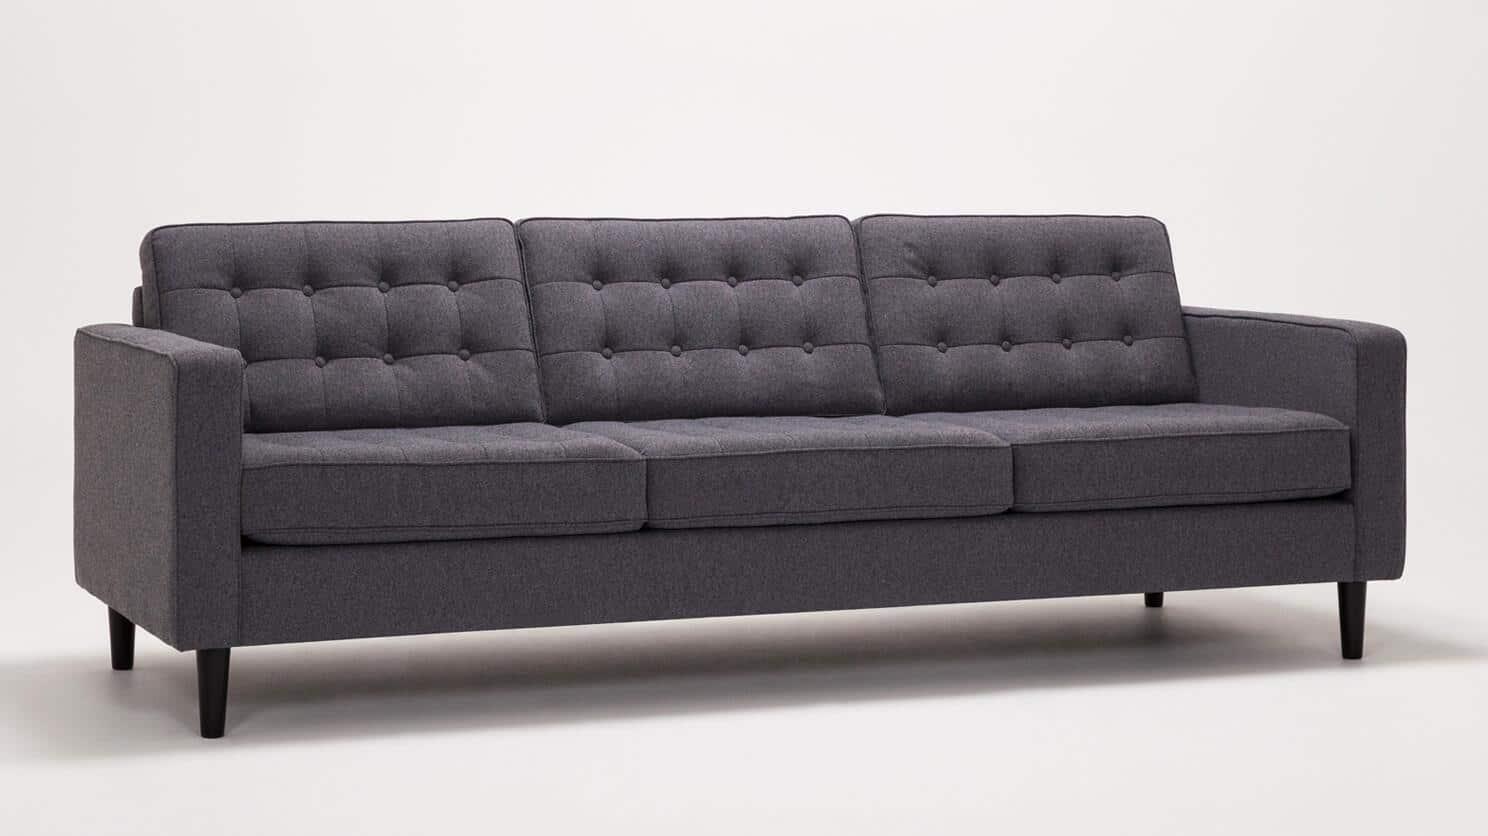 Jet Ash Sofa Front Angled